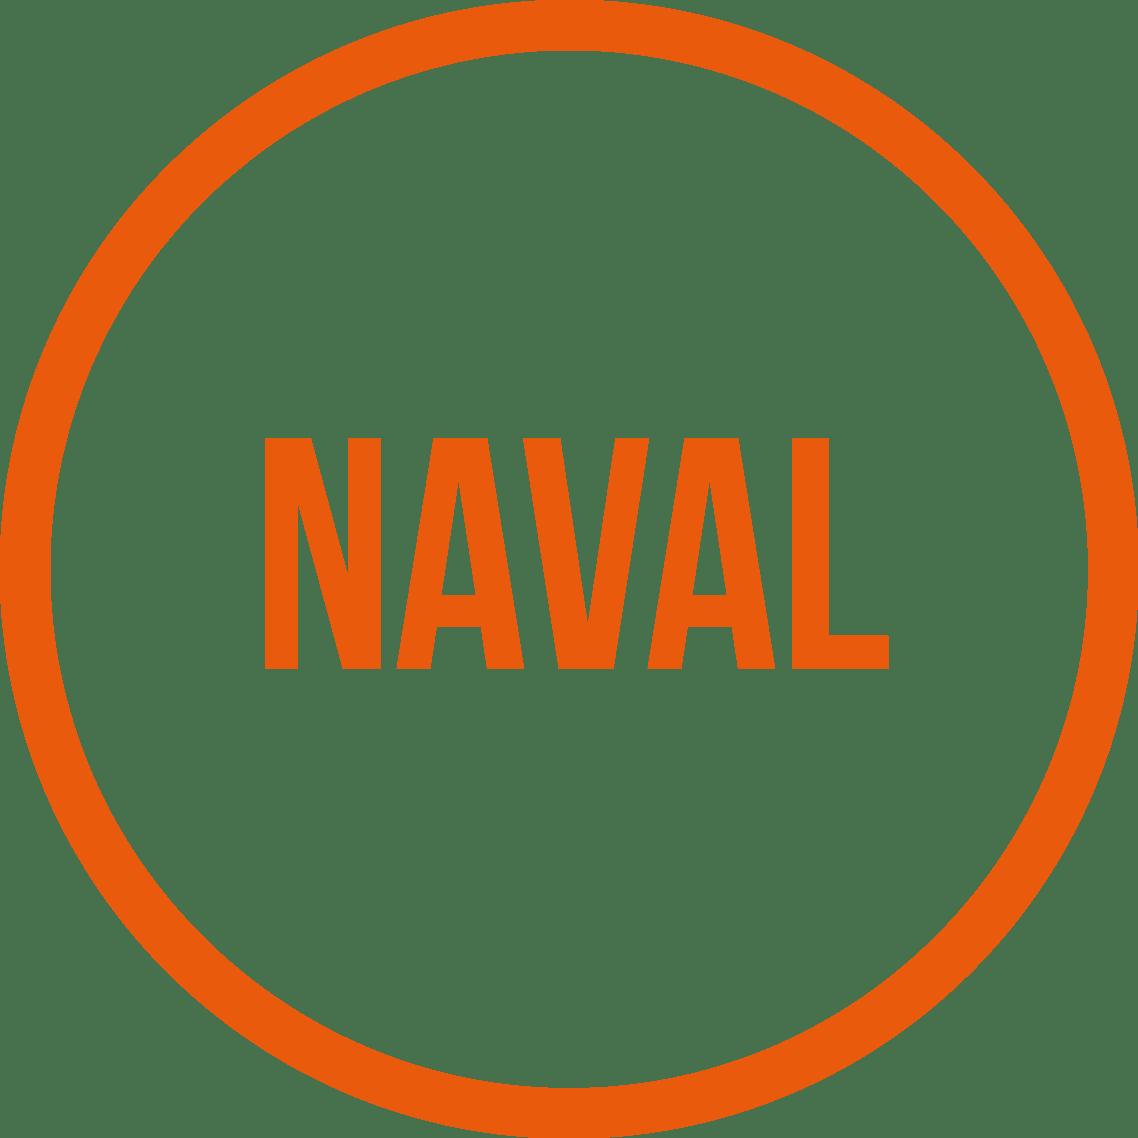 MENG_NAVAL MODEL SET WARSHIP